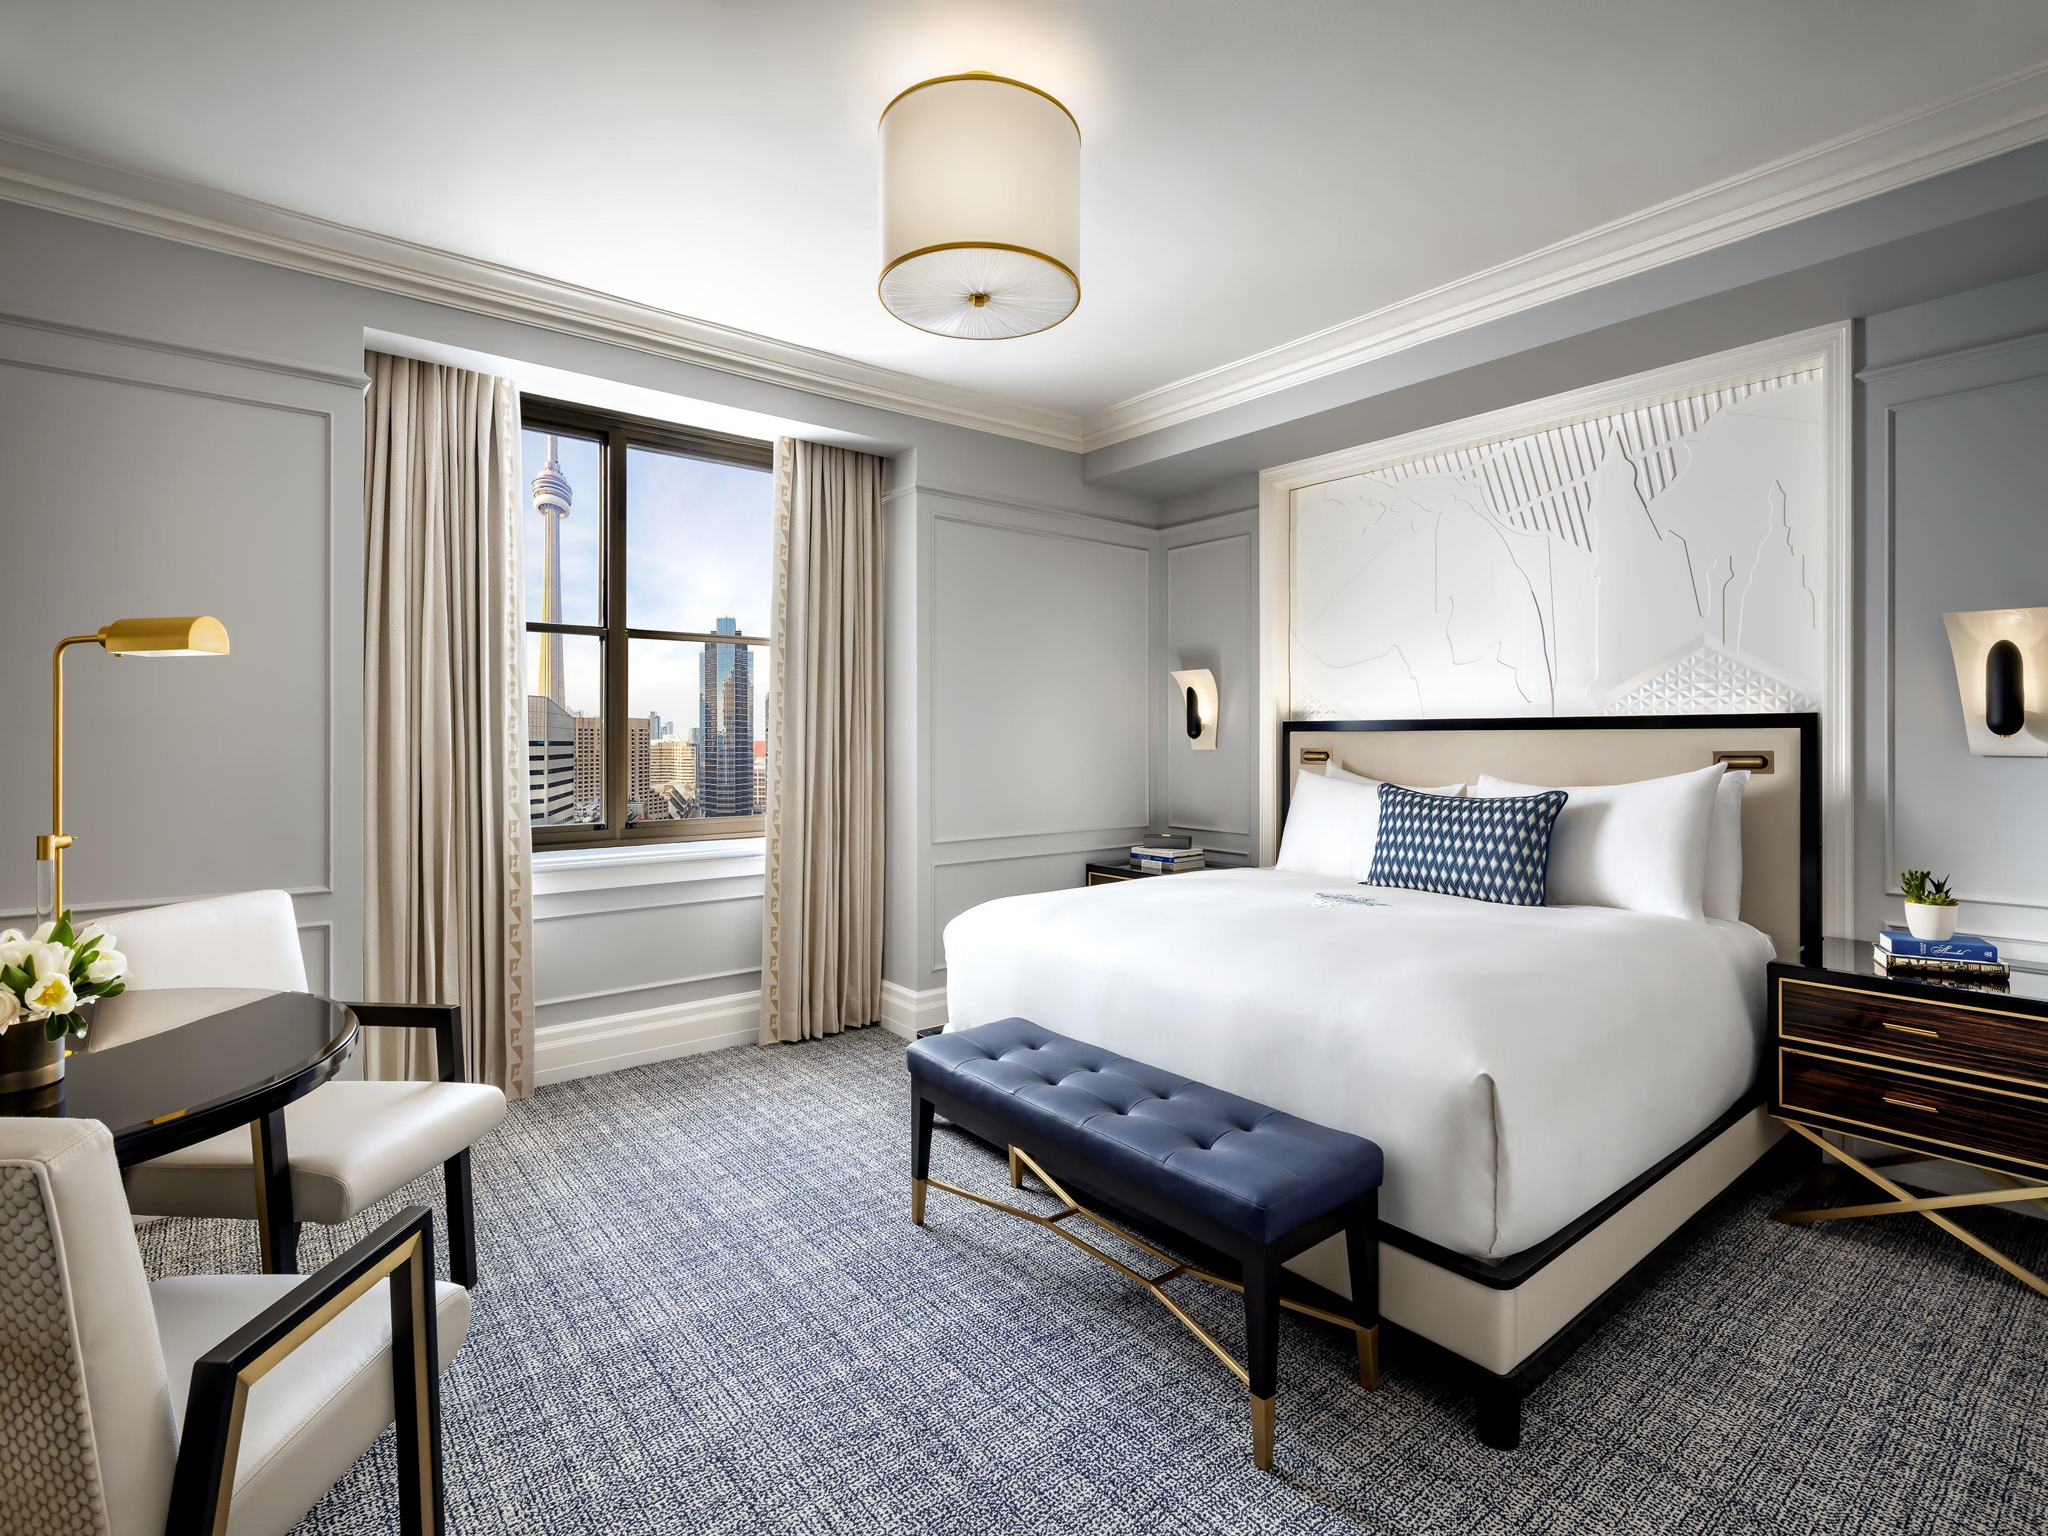 hotel fairmont royal york rooms fairmont royal york